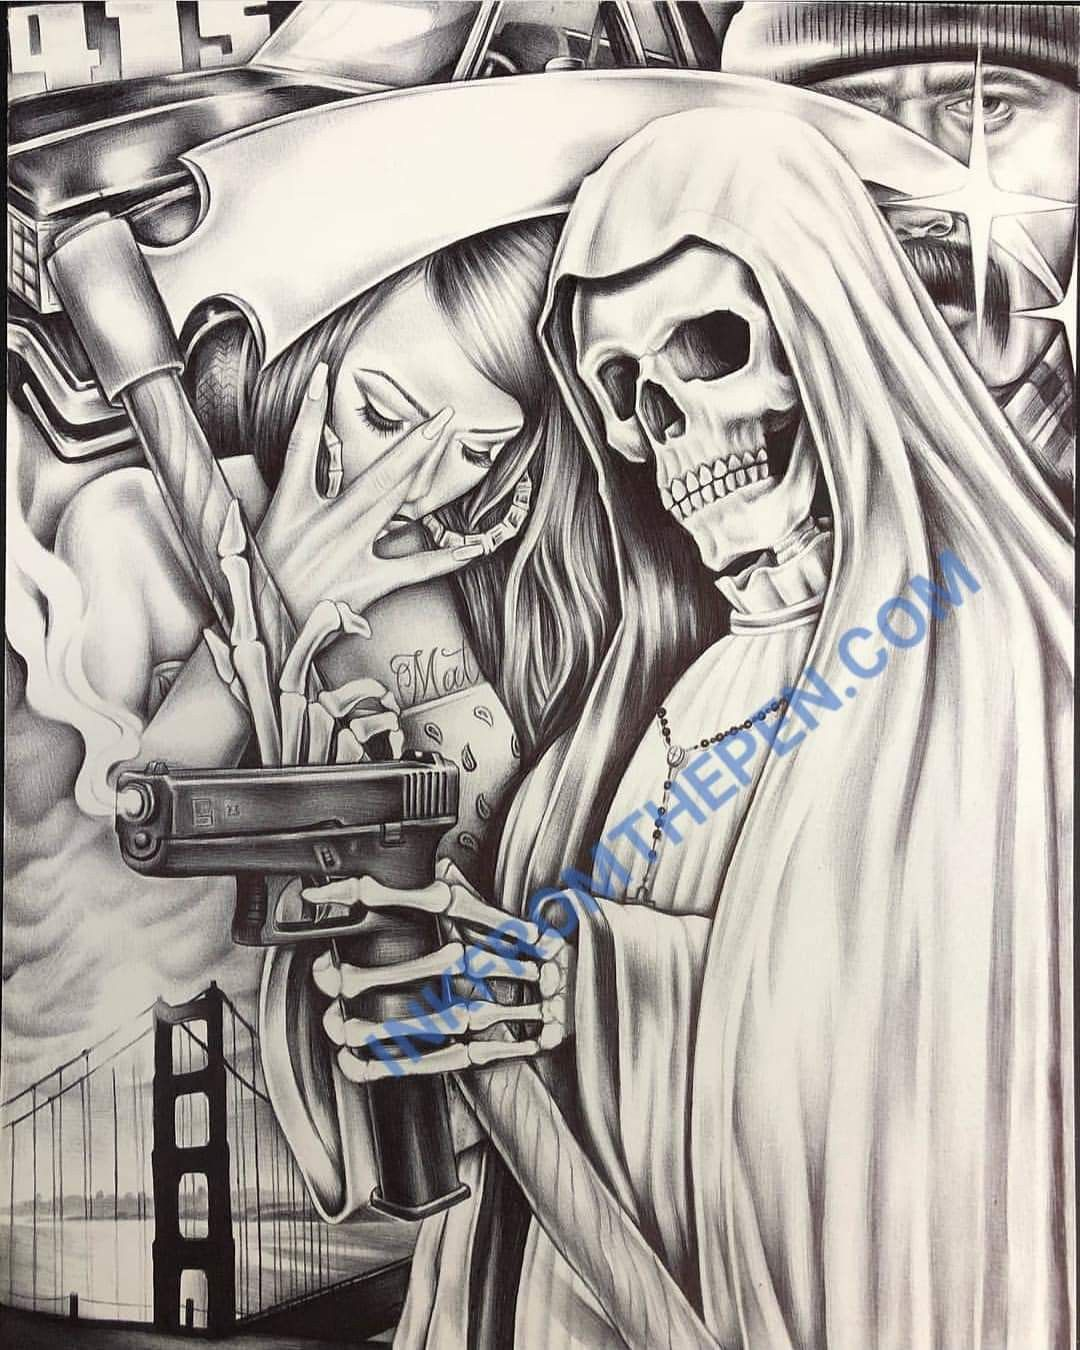 Love Chola Lowrider Graffiti Gangster Drawings